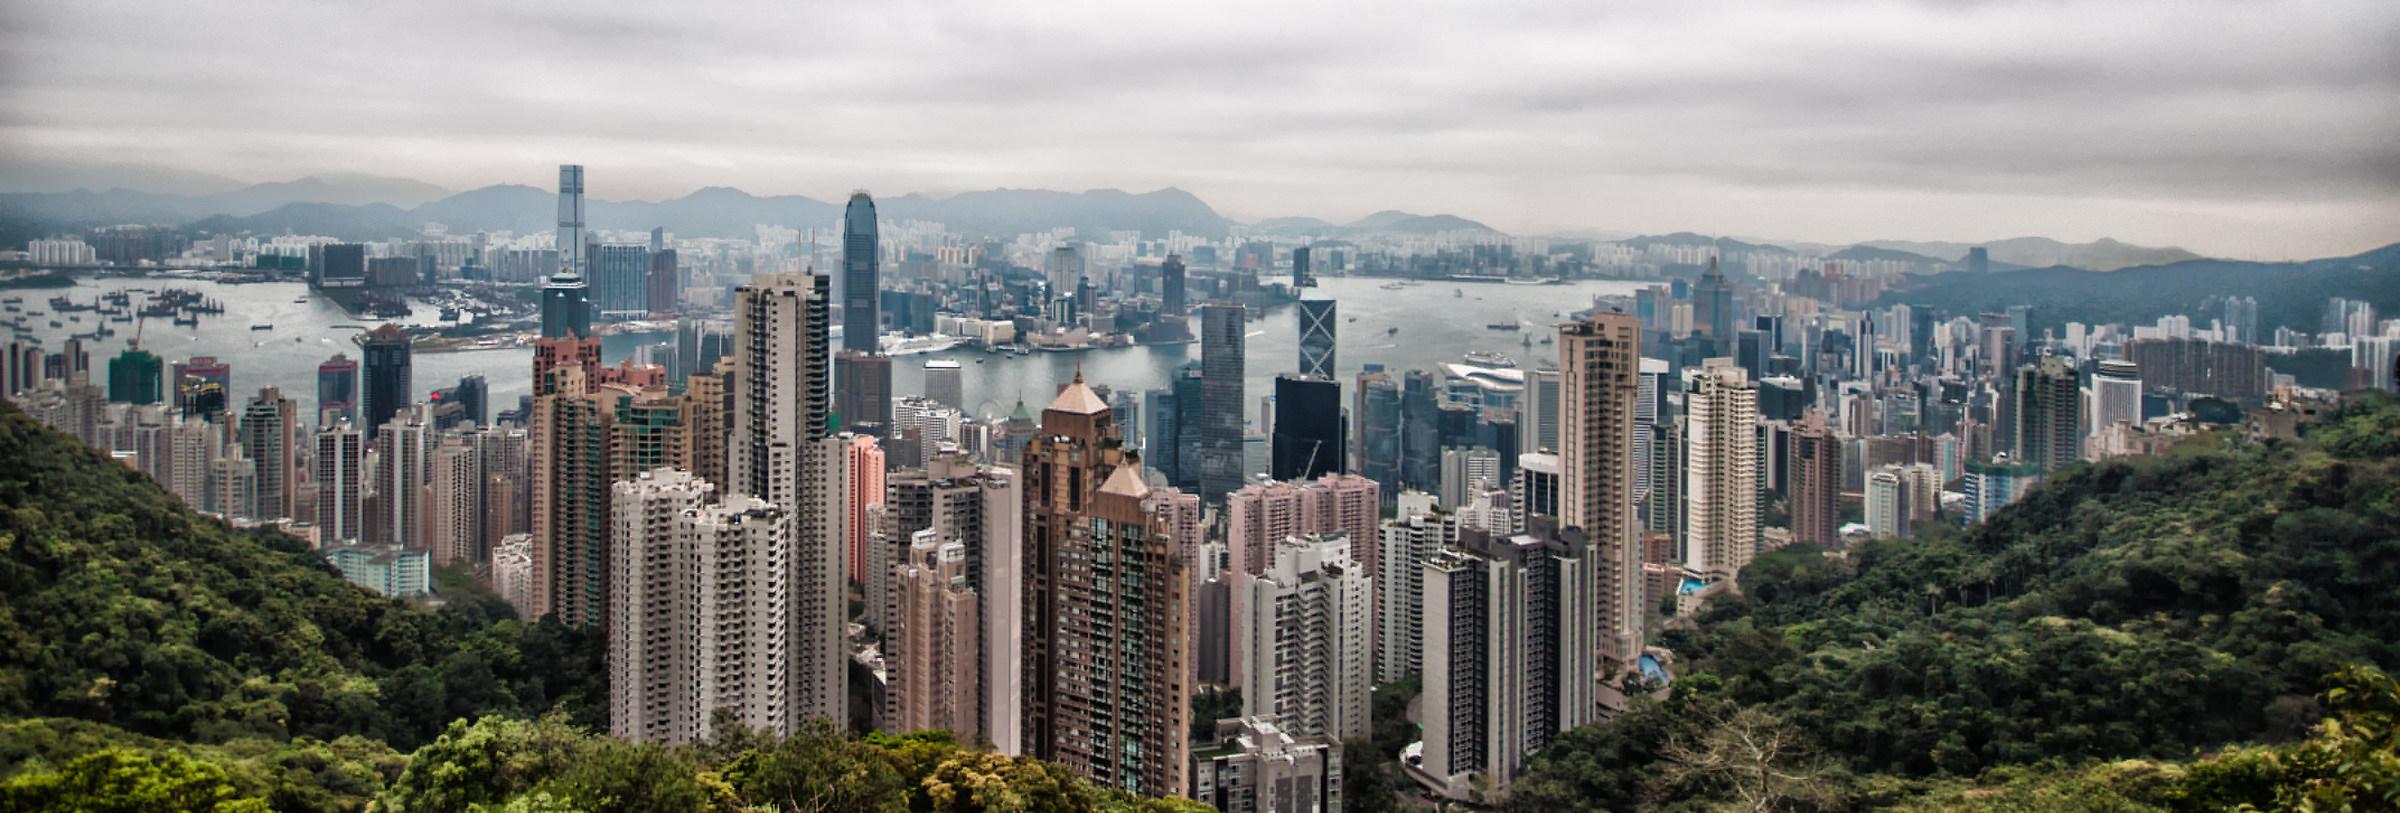 Hong Kong - The Peak...